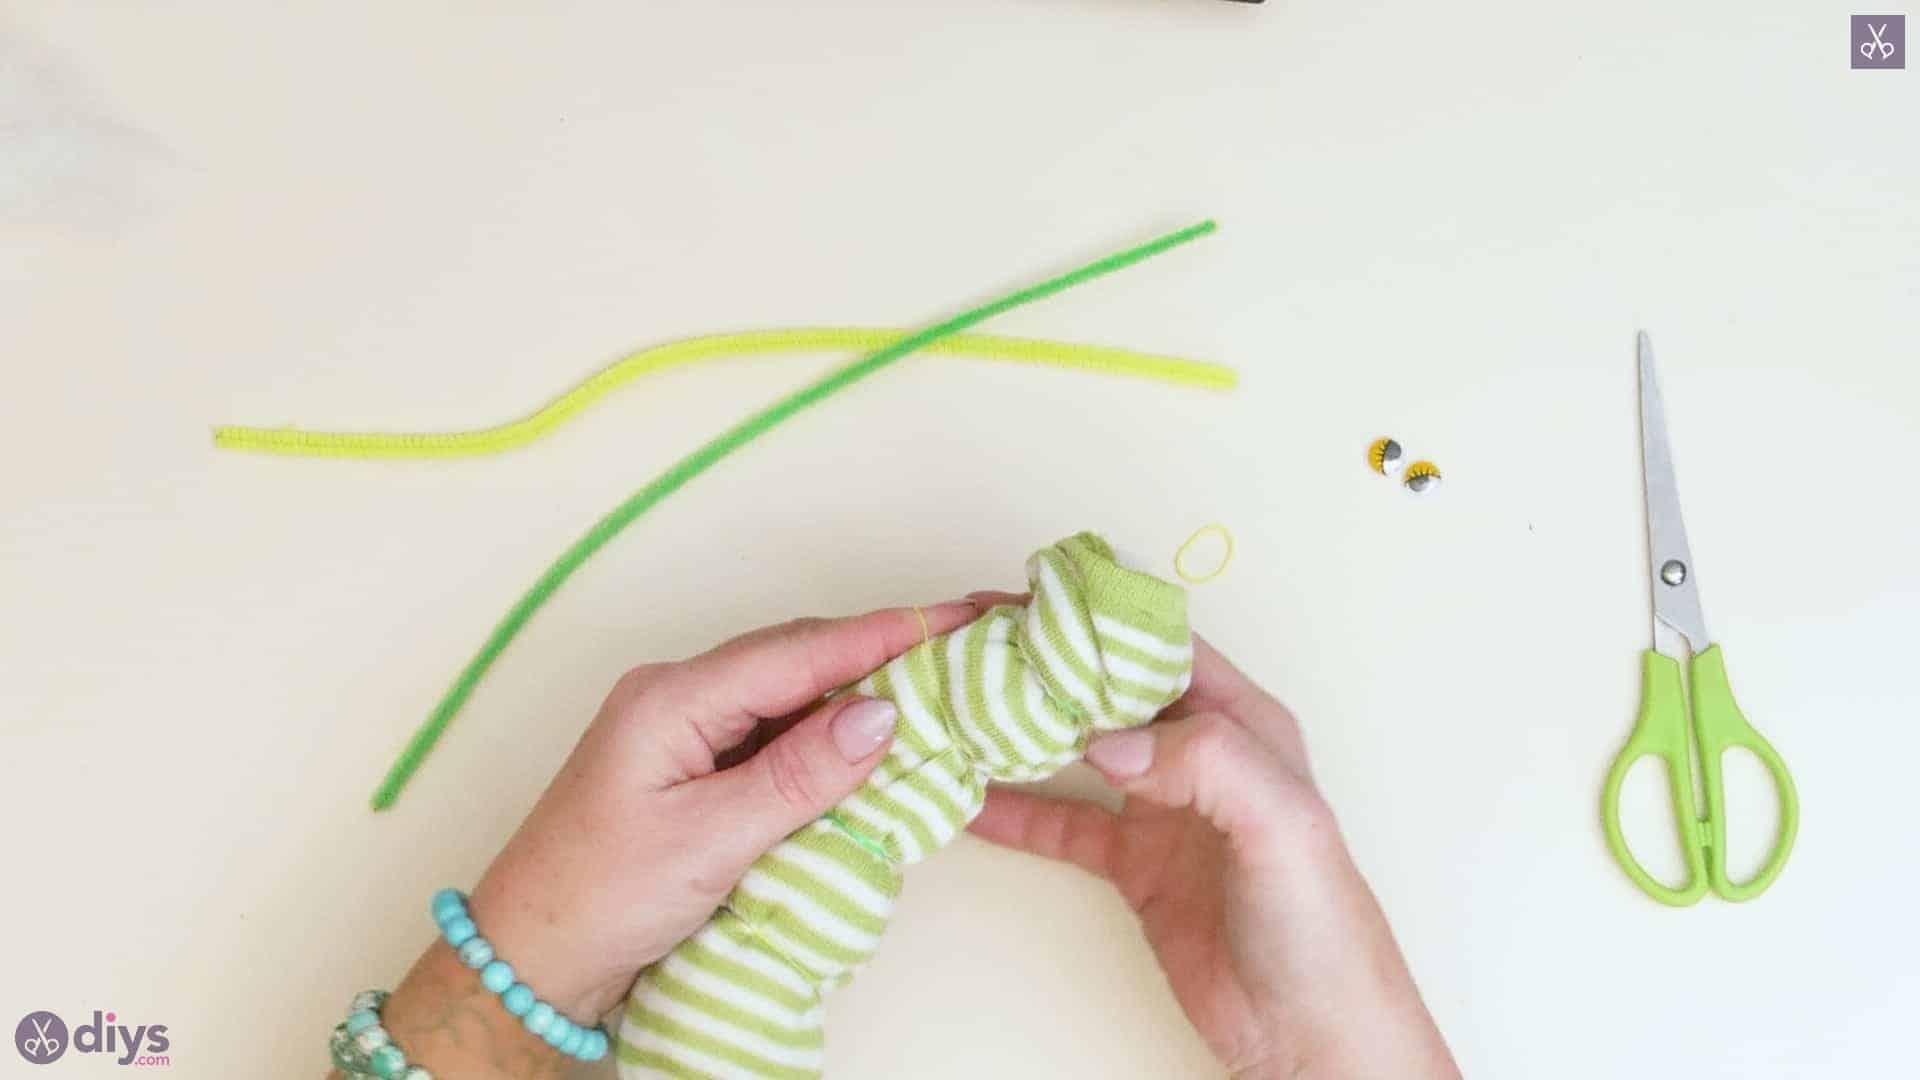 Diy no sew sock worm step 4c